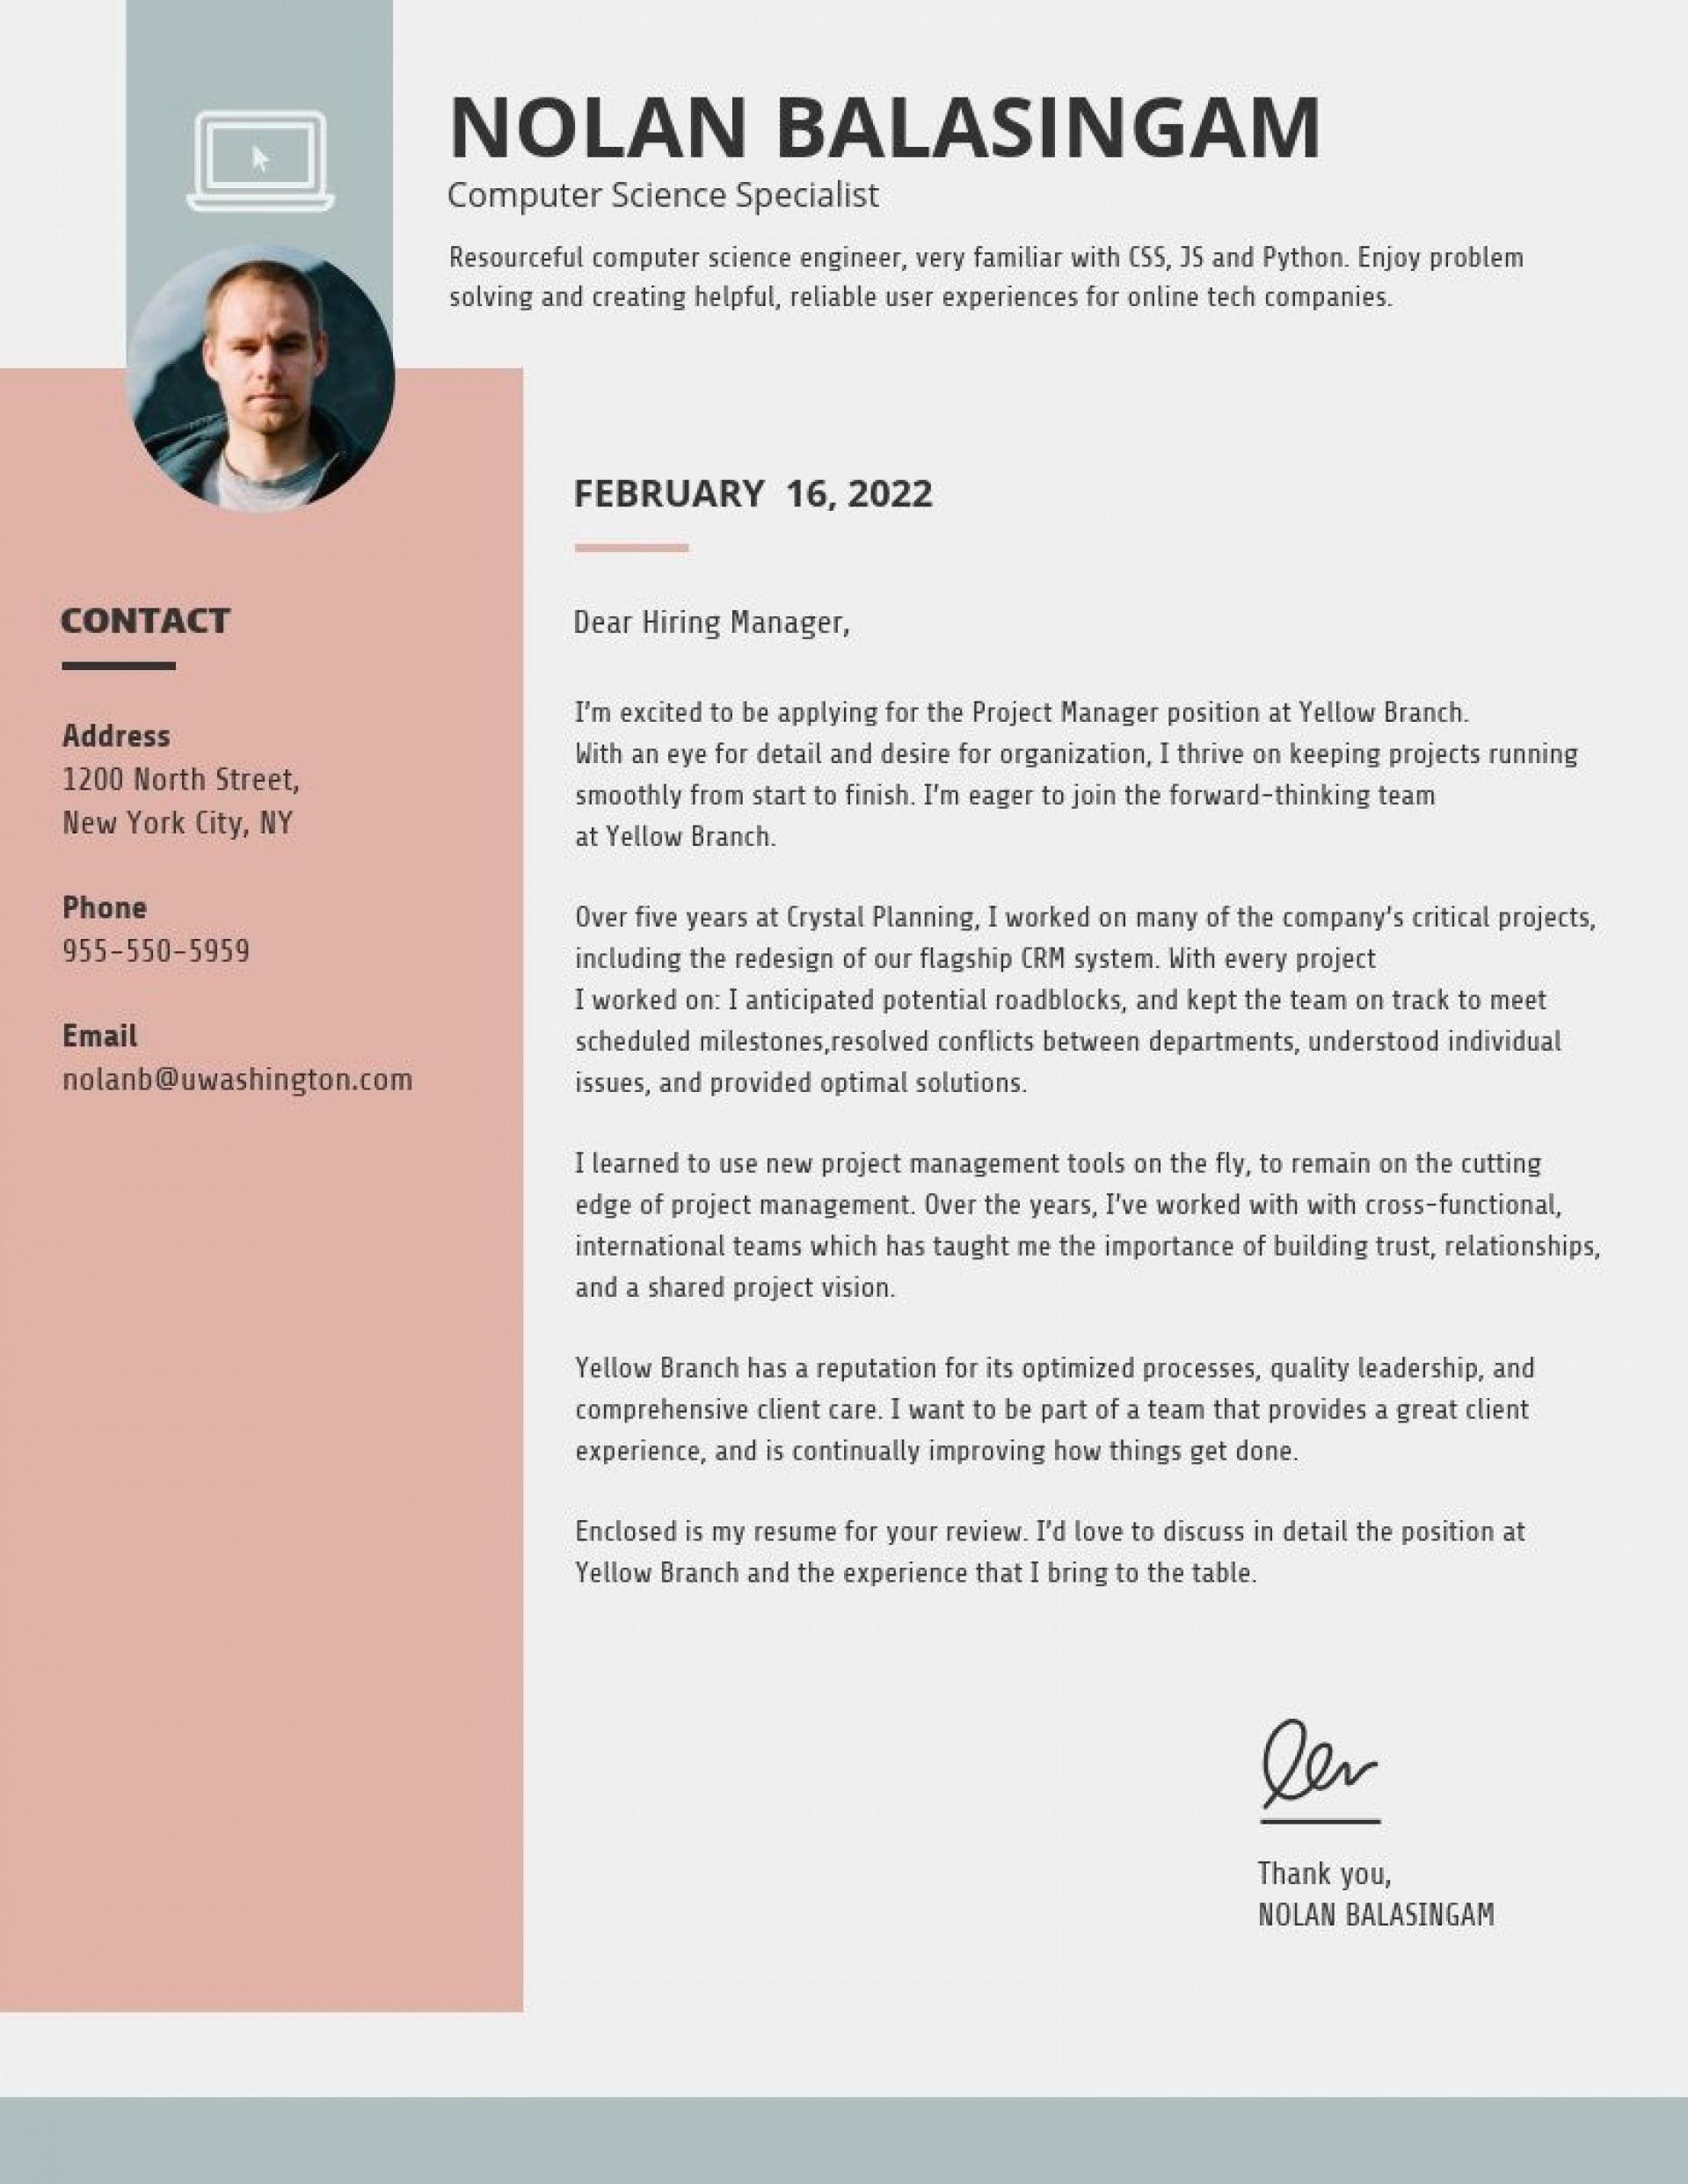 009 Marvelou Modern Cover Letter Example Inspiration  2019 Sample1920